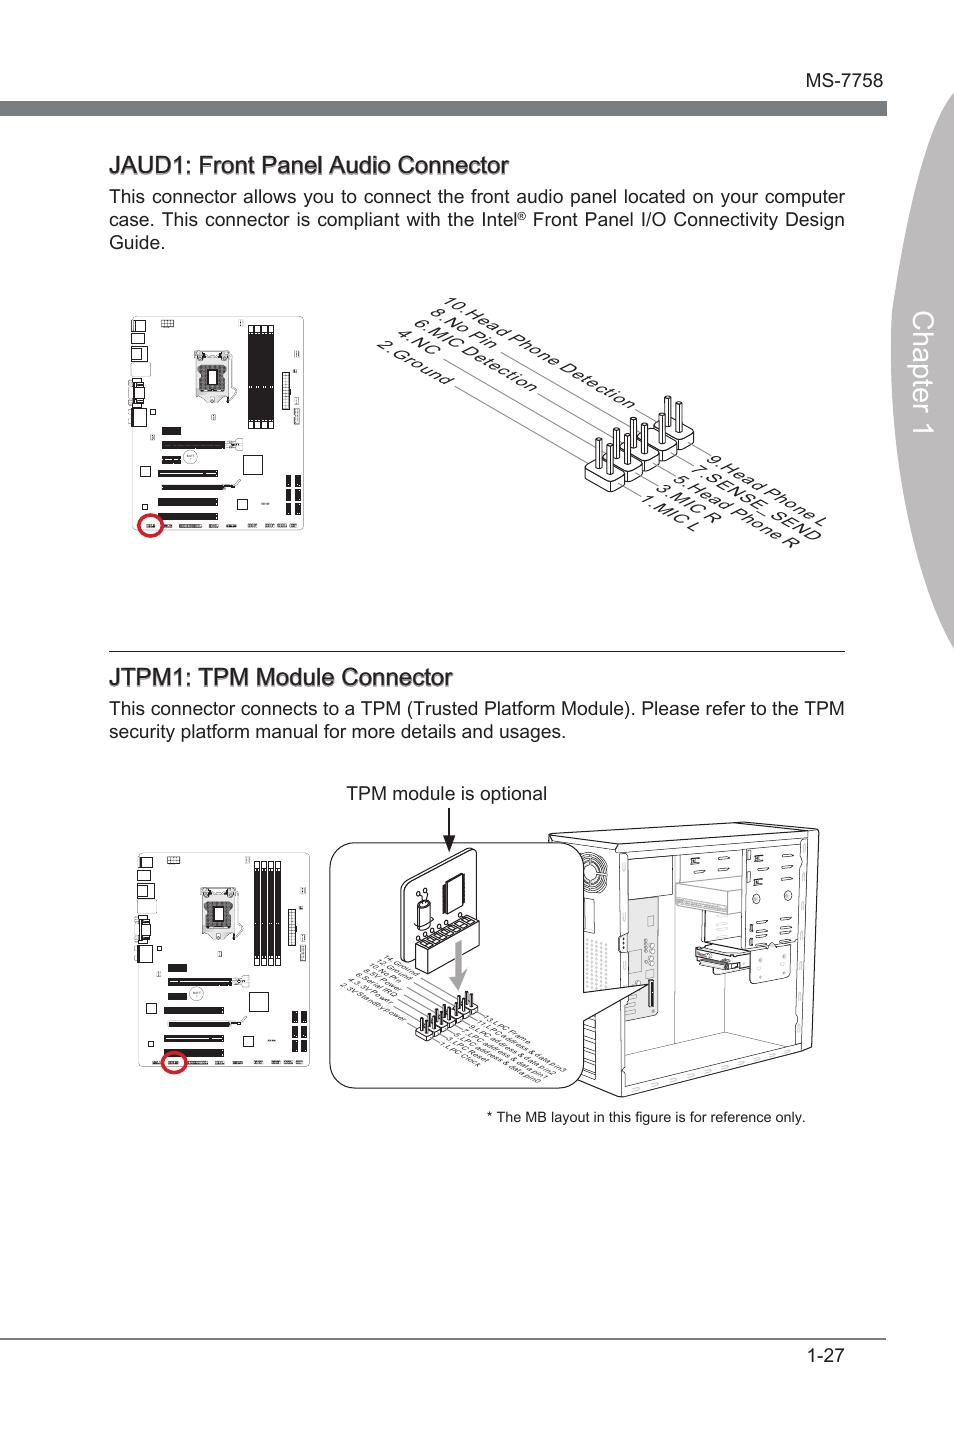 Jaud1: front panel audio connector, Jtpm1: tpm module connector